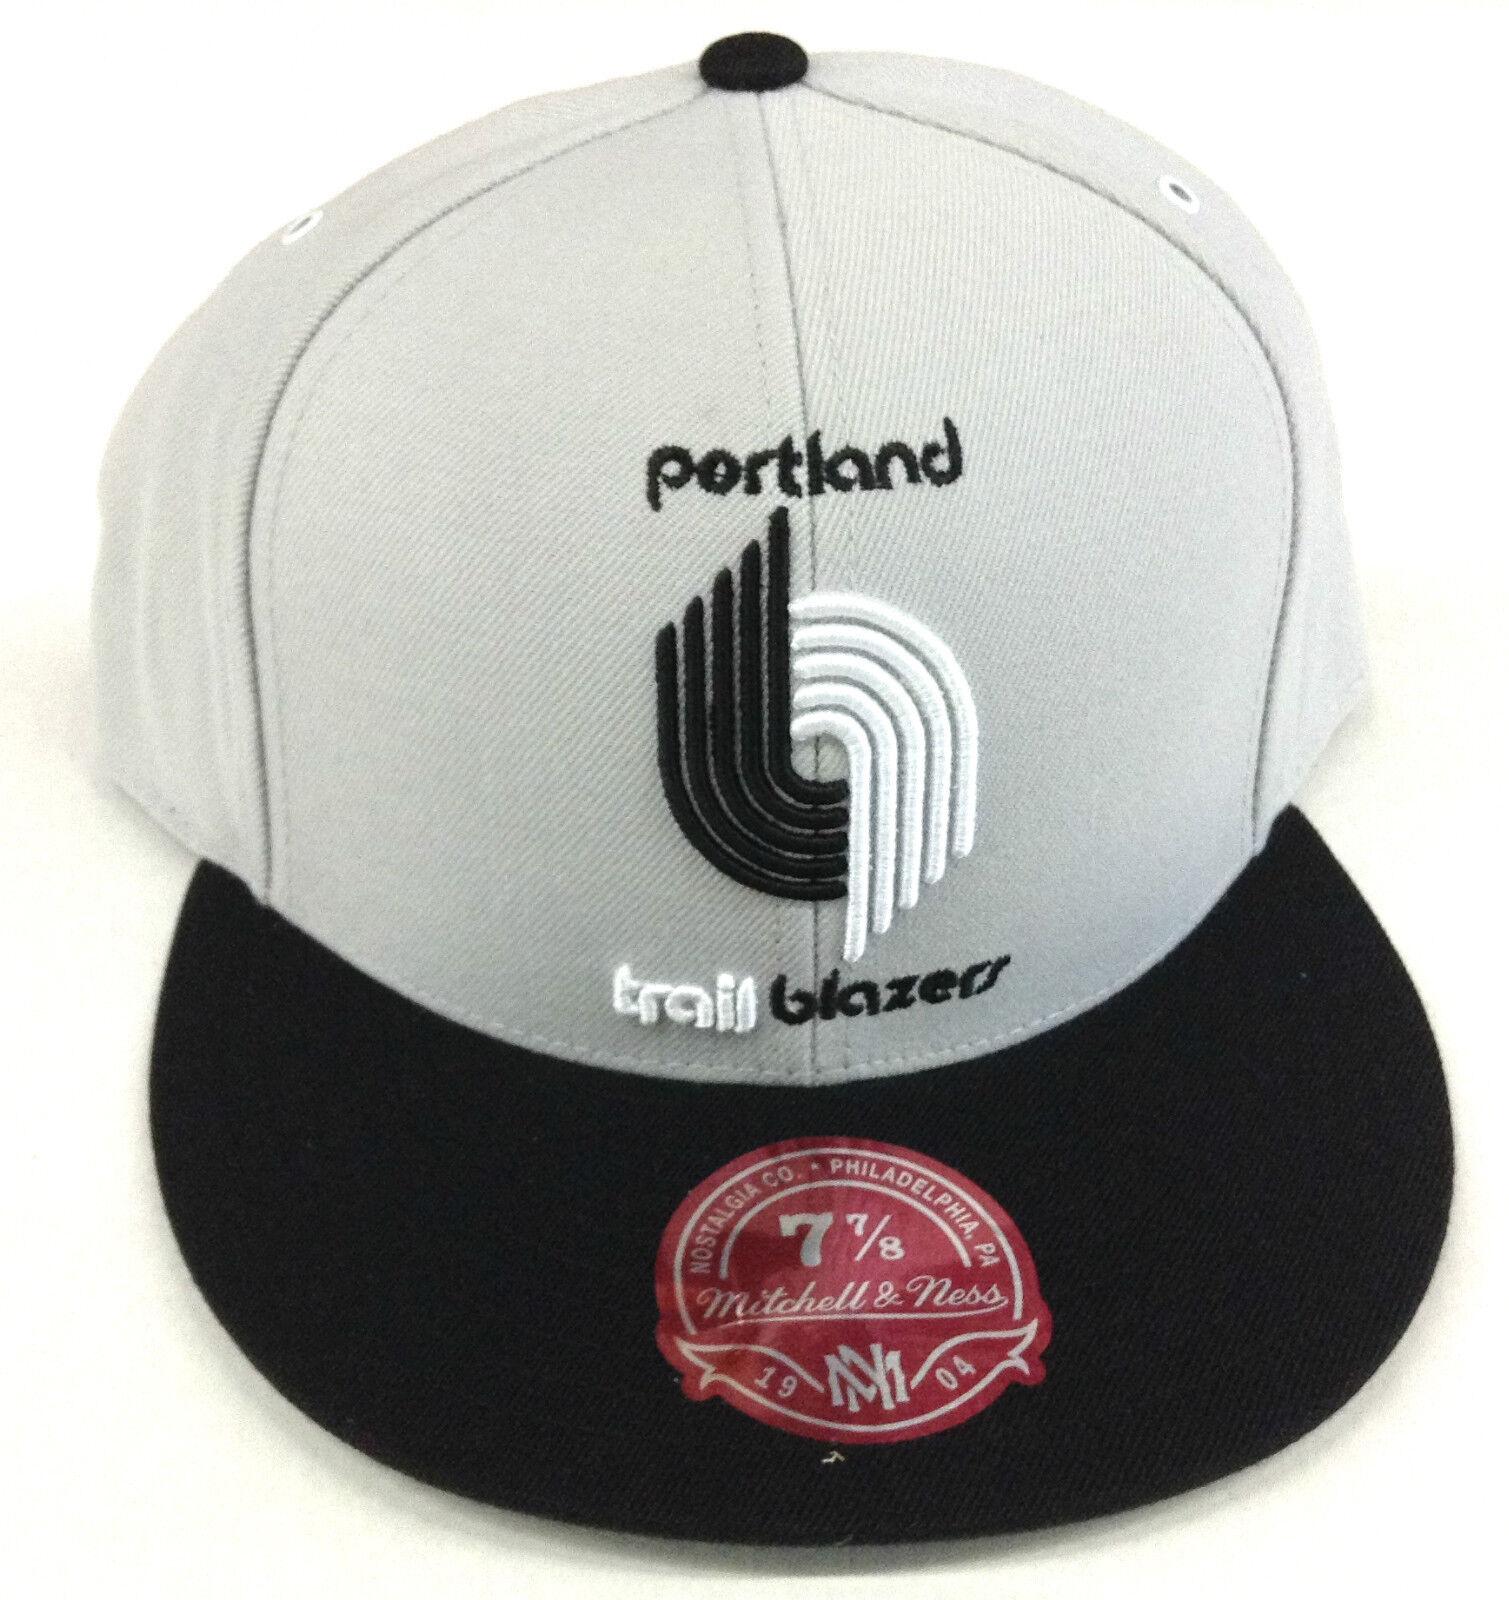 NBA Portland Trailblazer Trailblazer Trailblazer Mitchell & Ness Flat Cap Hut Neu 38e9e5